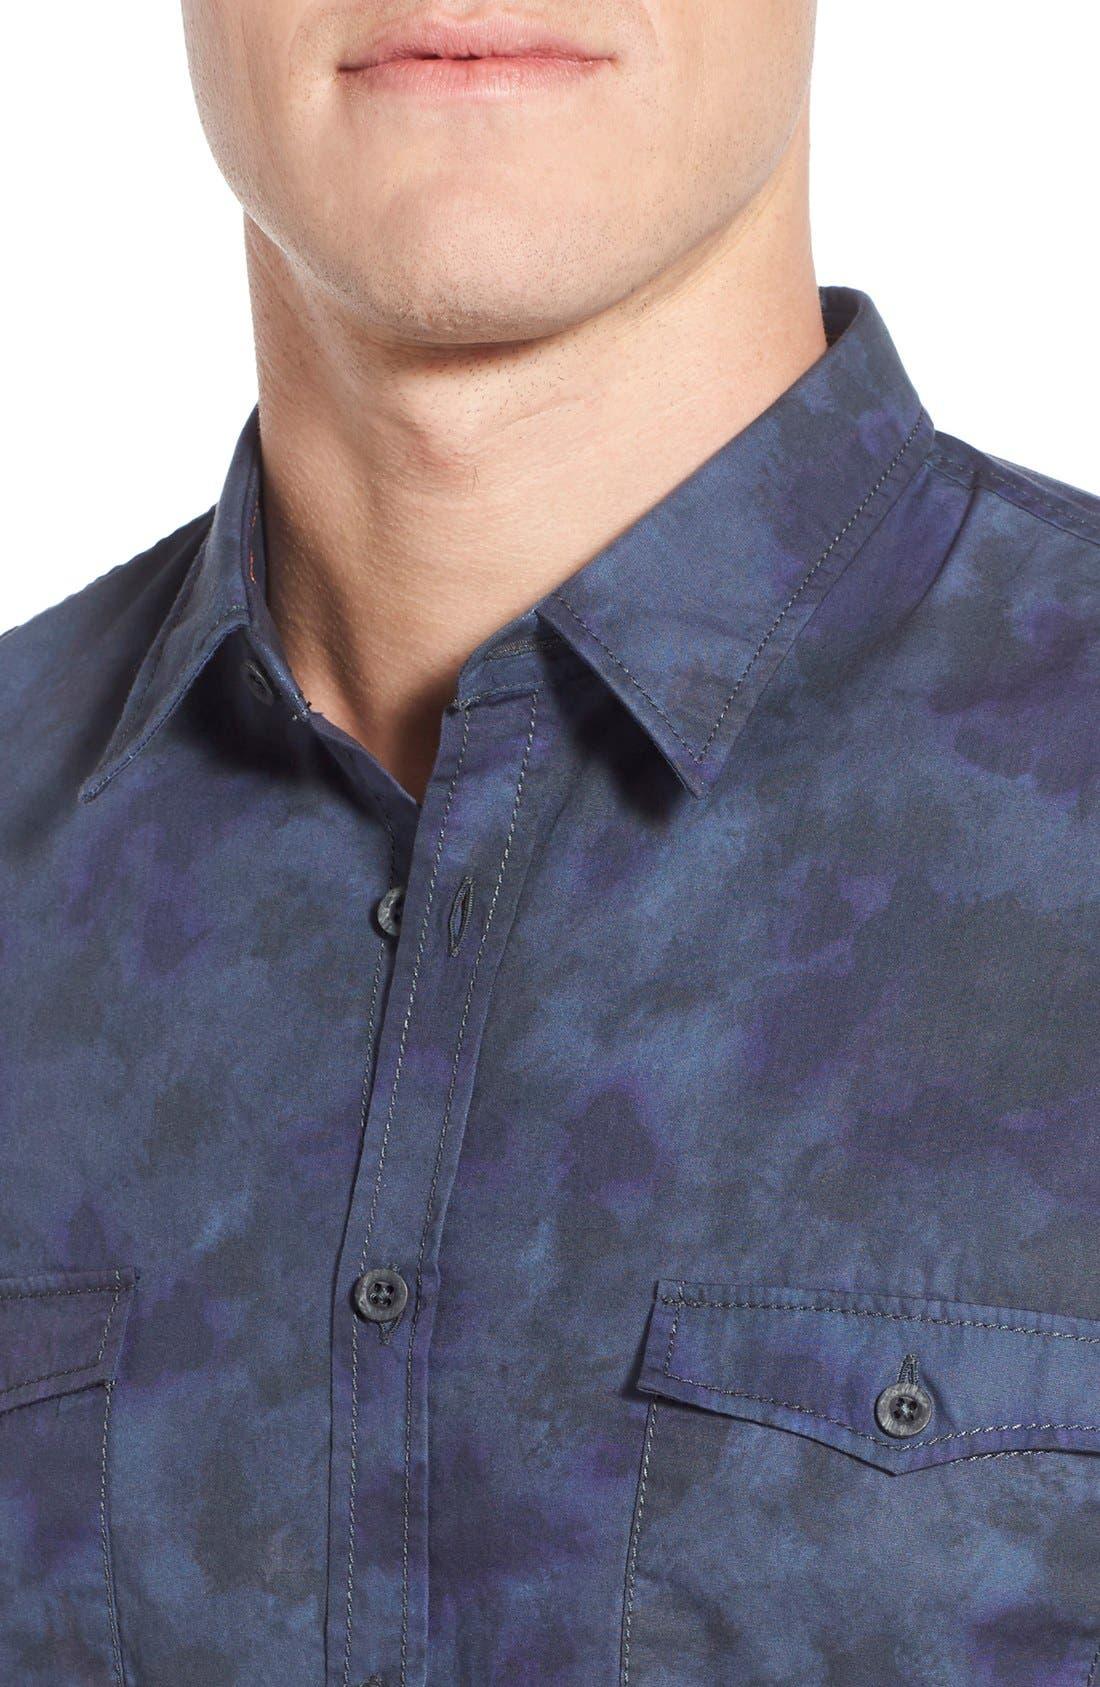 Edoslime Extra Trim Fit Print Woven Shirt,                             Alternate thumbnail 4, color,                             404